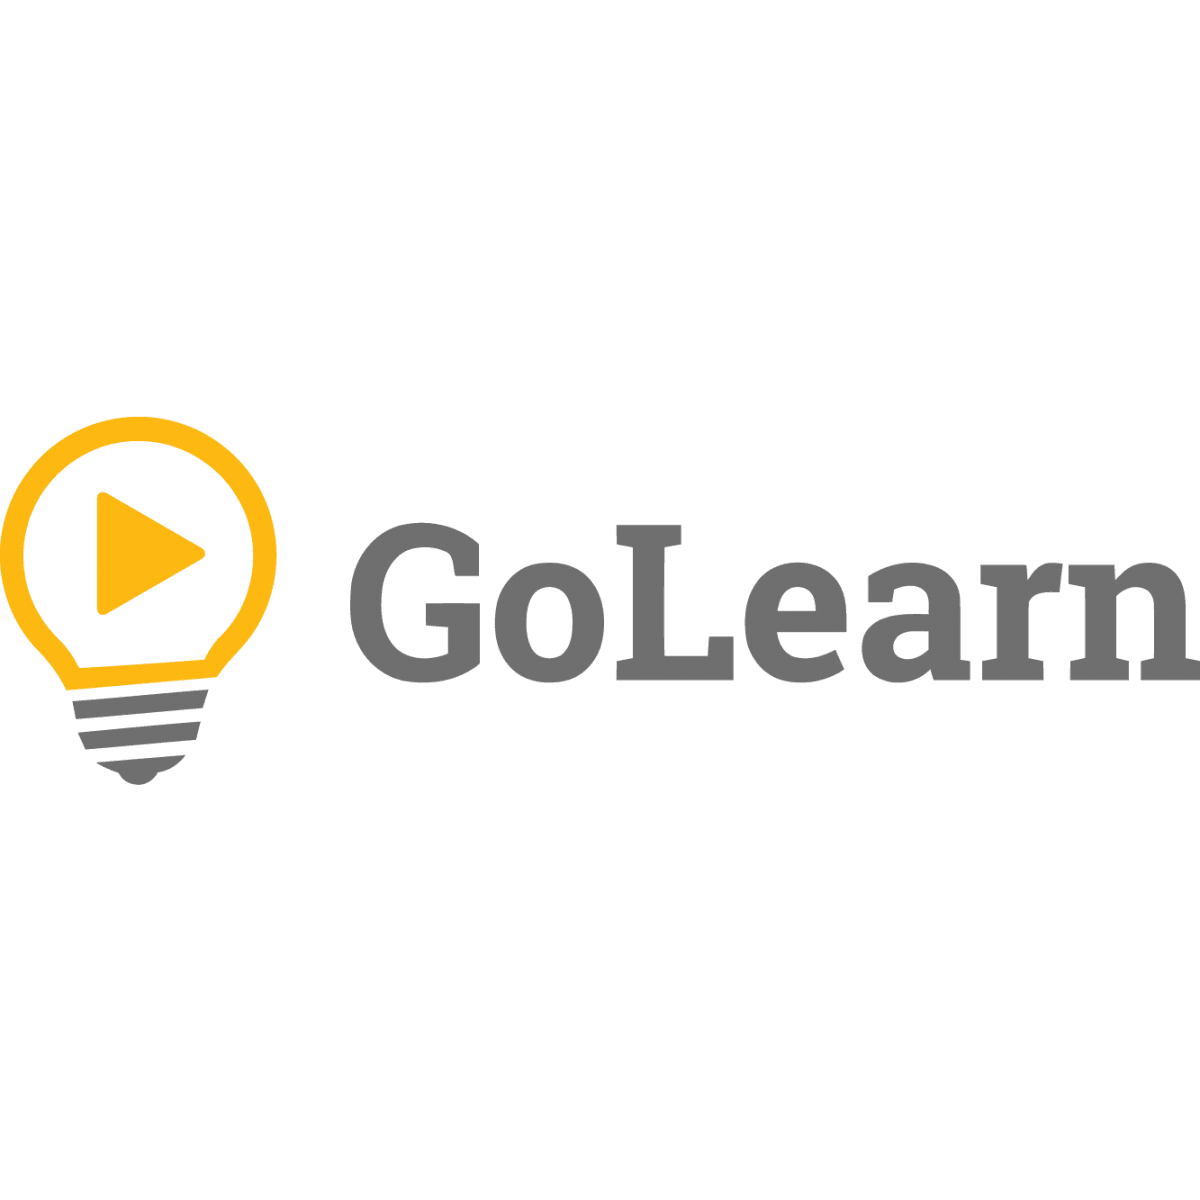 GoLearn logo png lille startup online kurser markedsføring microsoft office